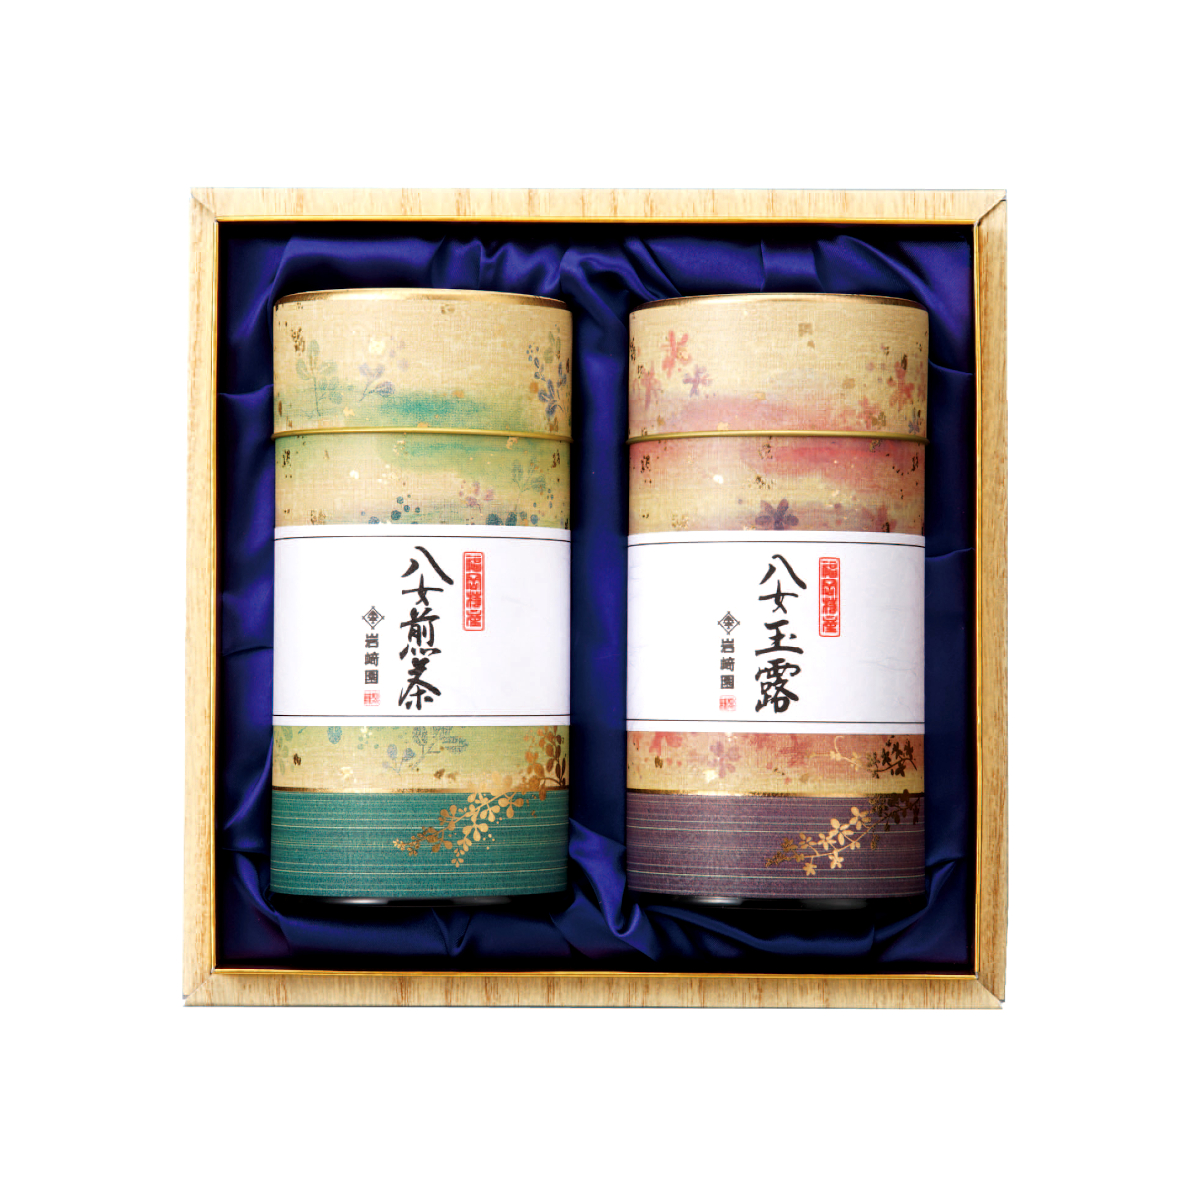 【G-602・ヌニ】玉露銀・特上煎茶 170g×2本ギフト